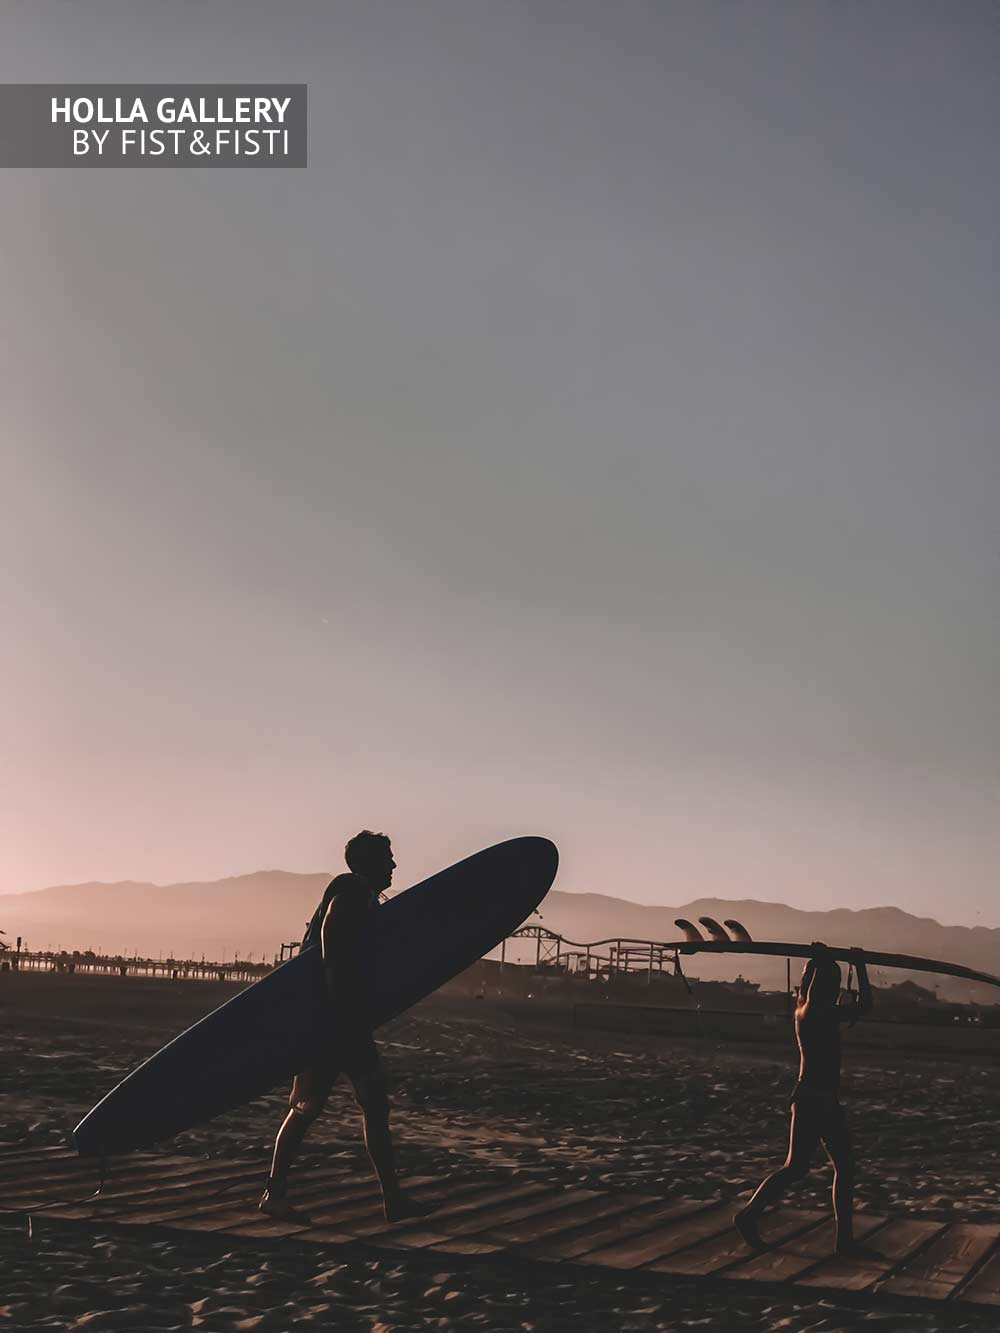 Серферы на пляже в Санта-Монике с досками в руках. Ясное небо и горы на фоне